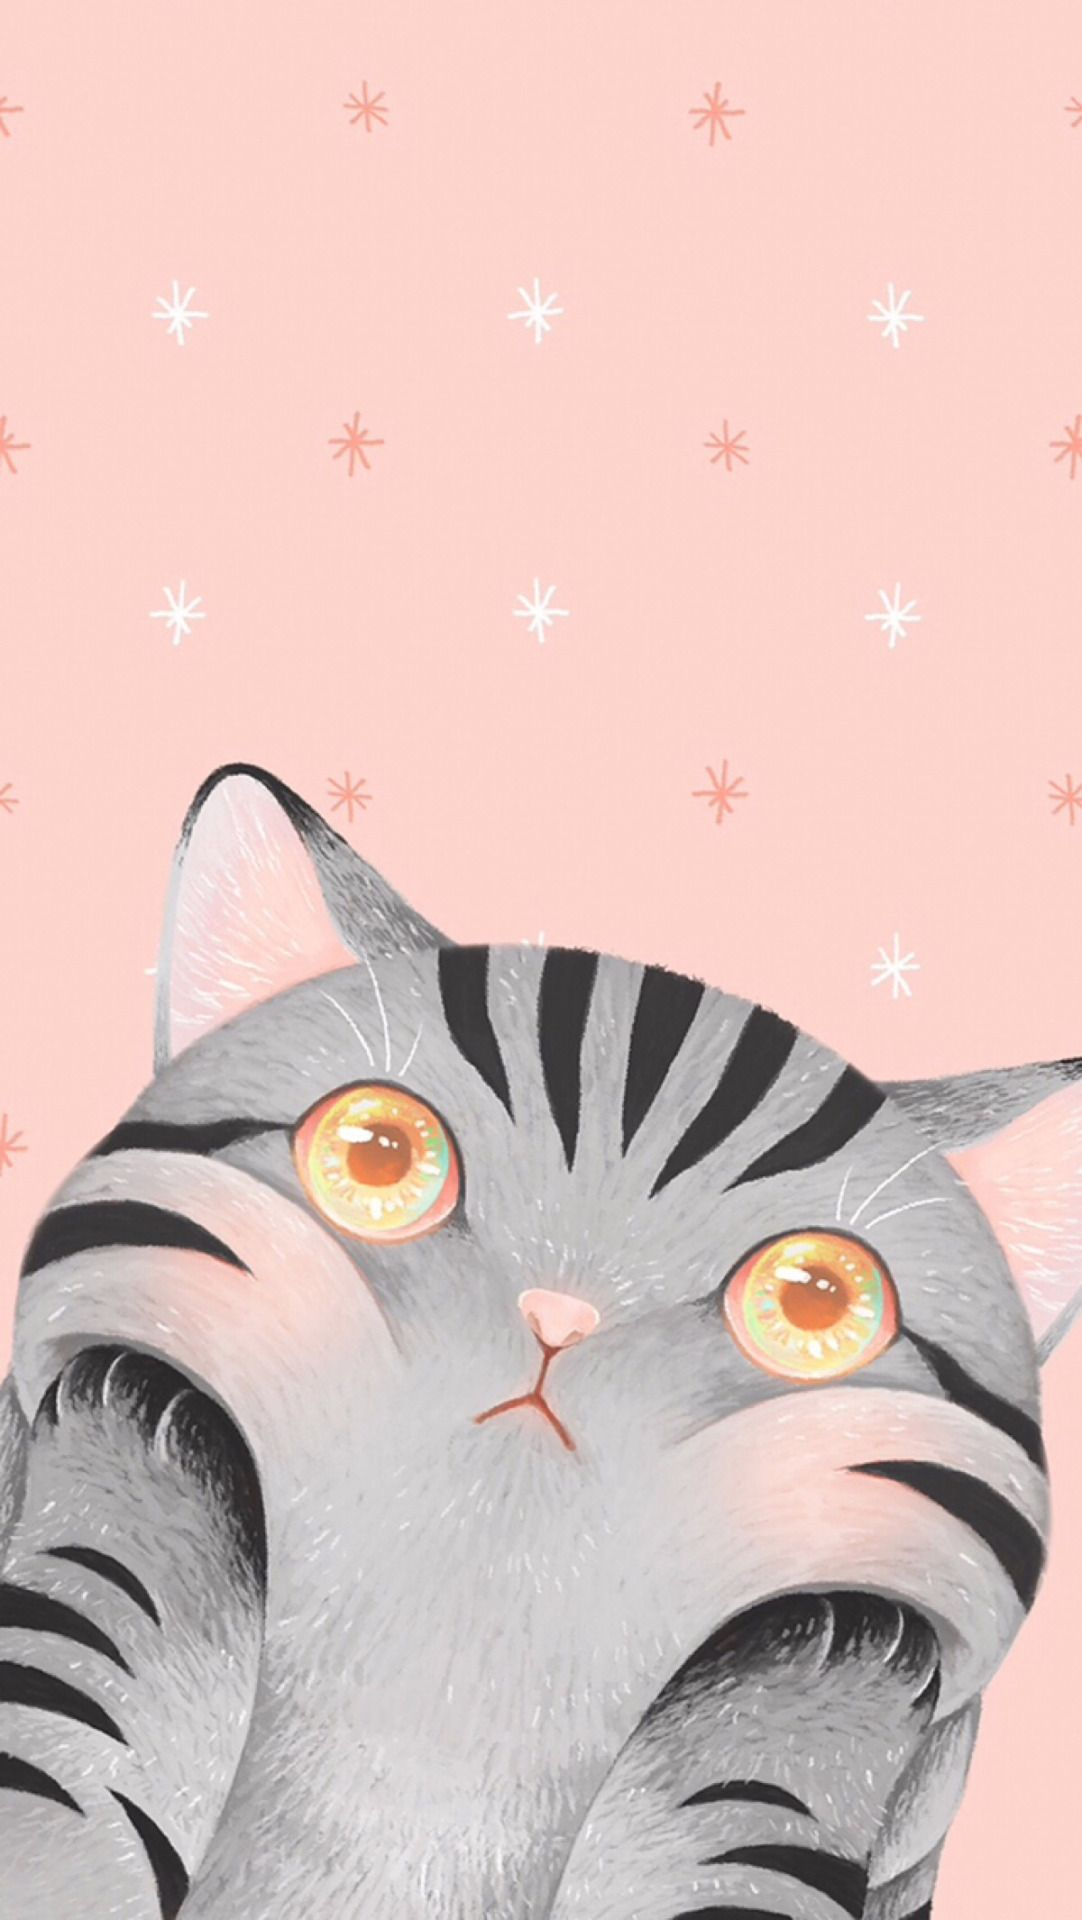 Sweetlookinwalls Cute Wallpapers Cute Patterns Wallpaper Cat Phone Wallpaper